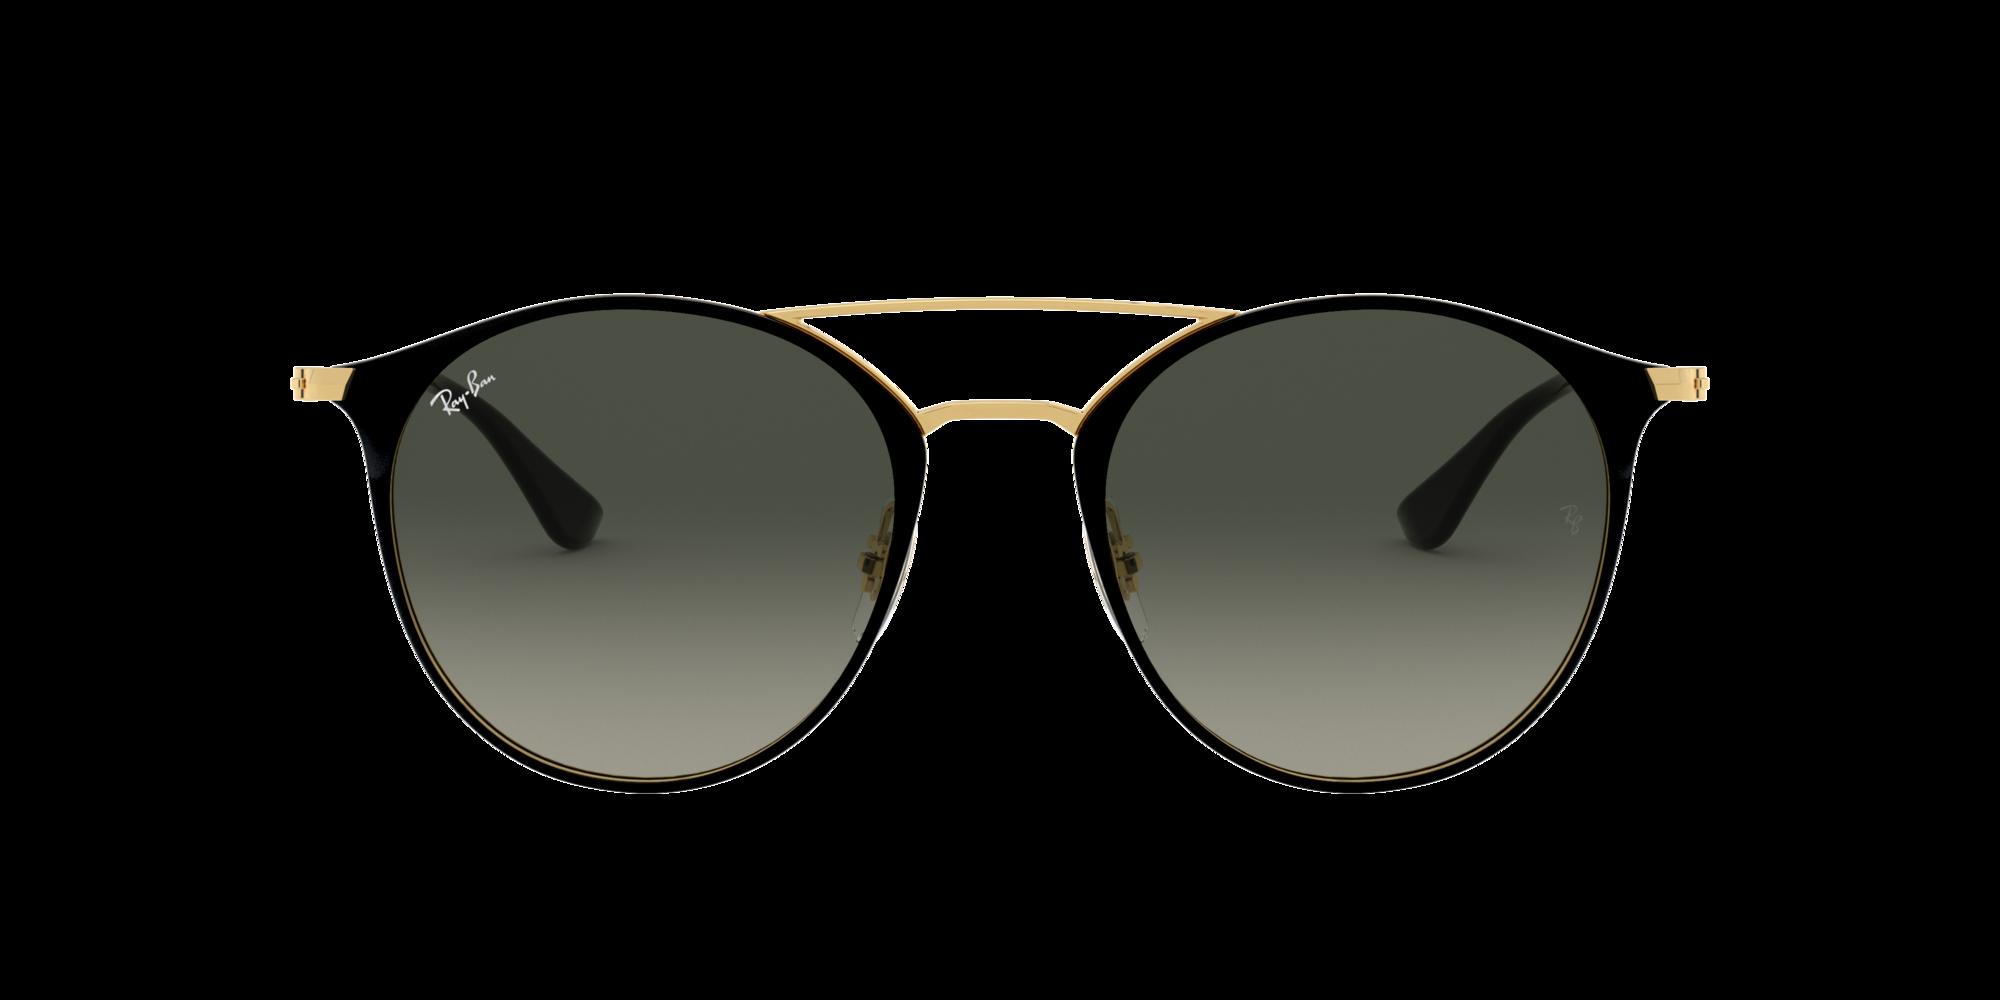 Image for RB3546 52 from LensCrafters | Glasses, Prescription Glasses Online, Eyewear